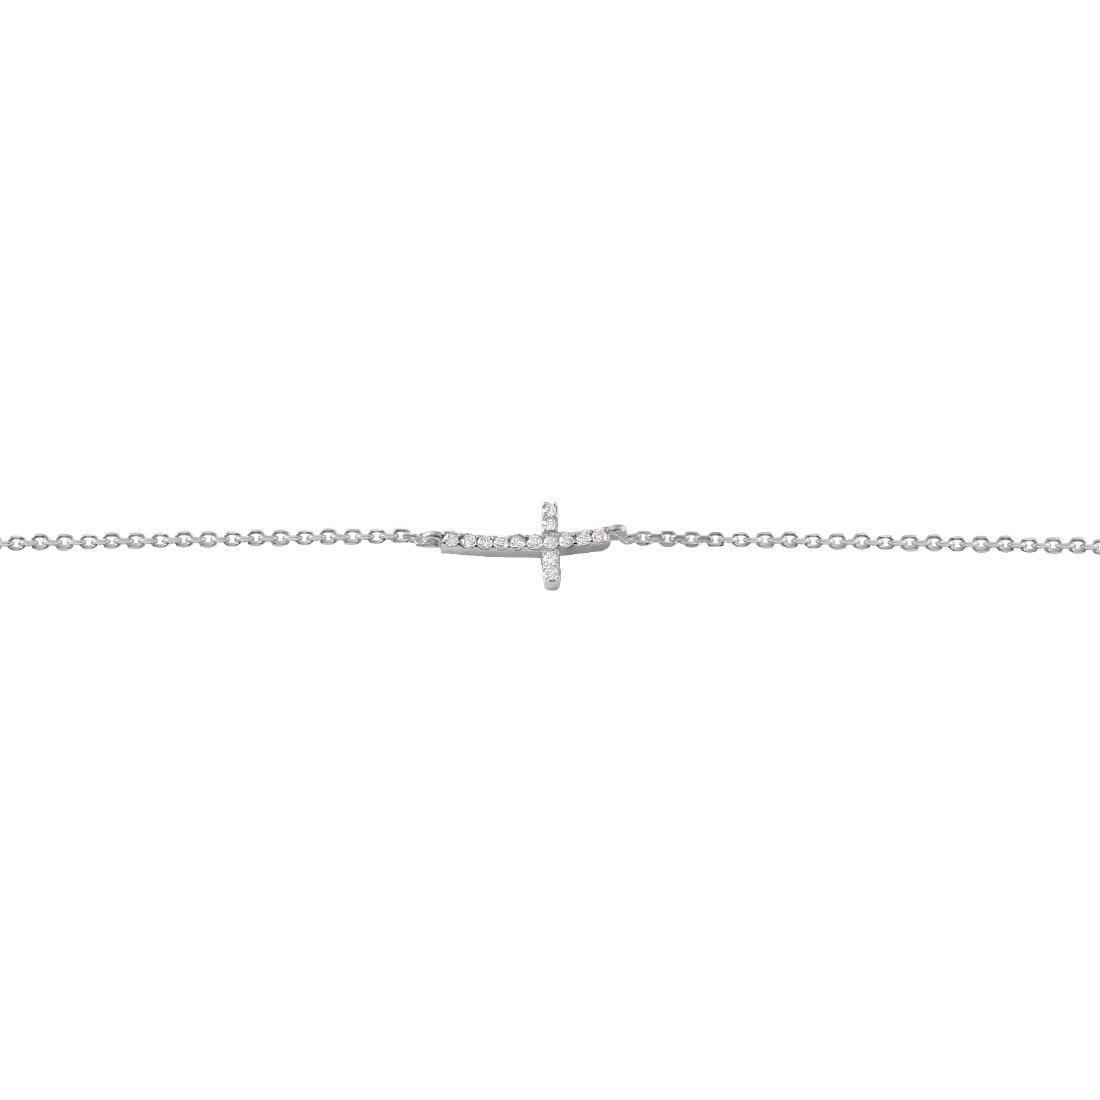 0.10 Carat Natural Diamond 18K Solid White Gold - 2